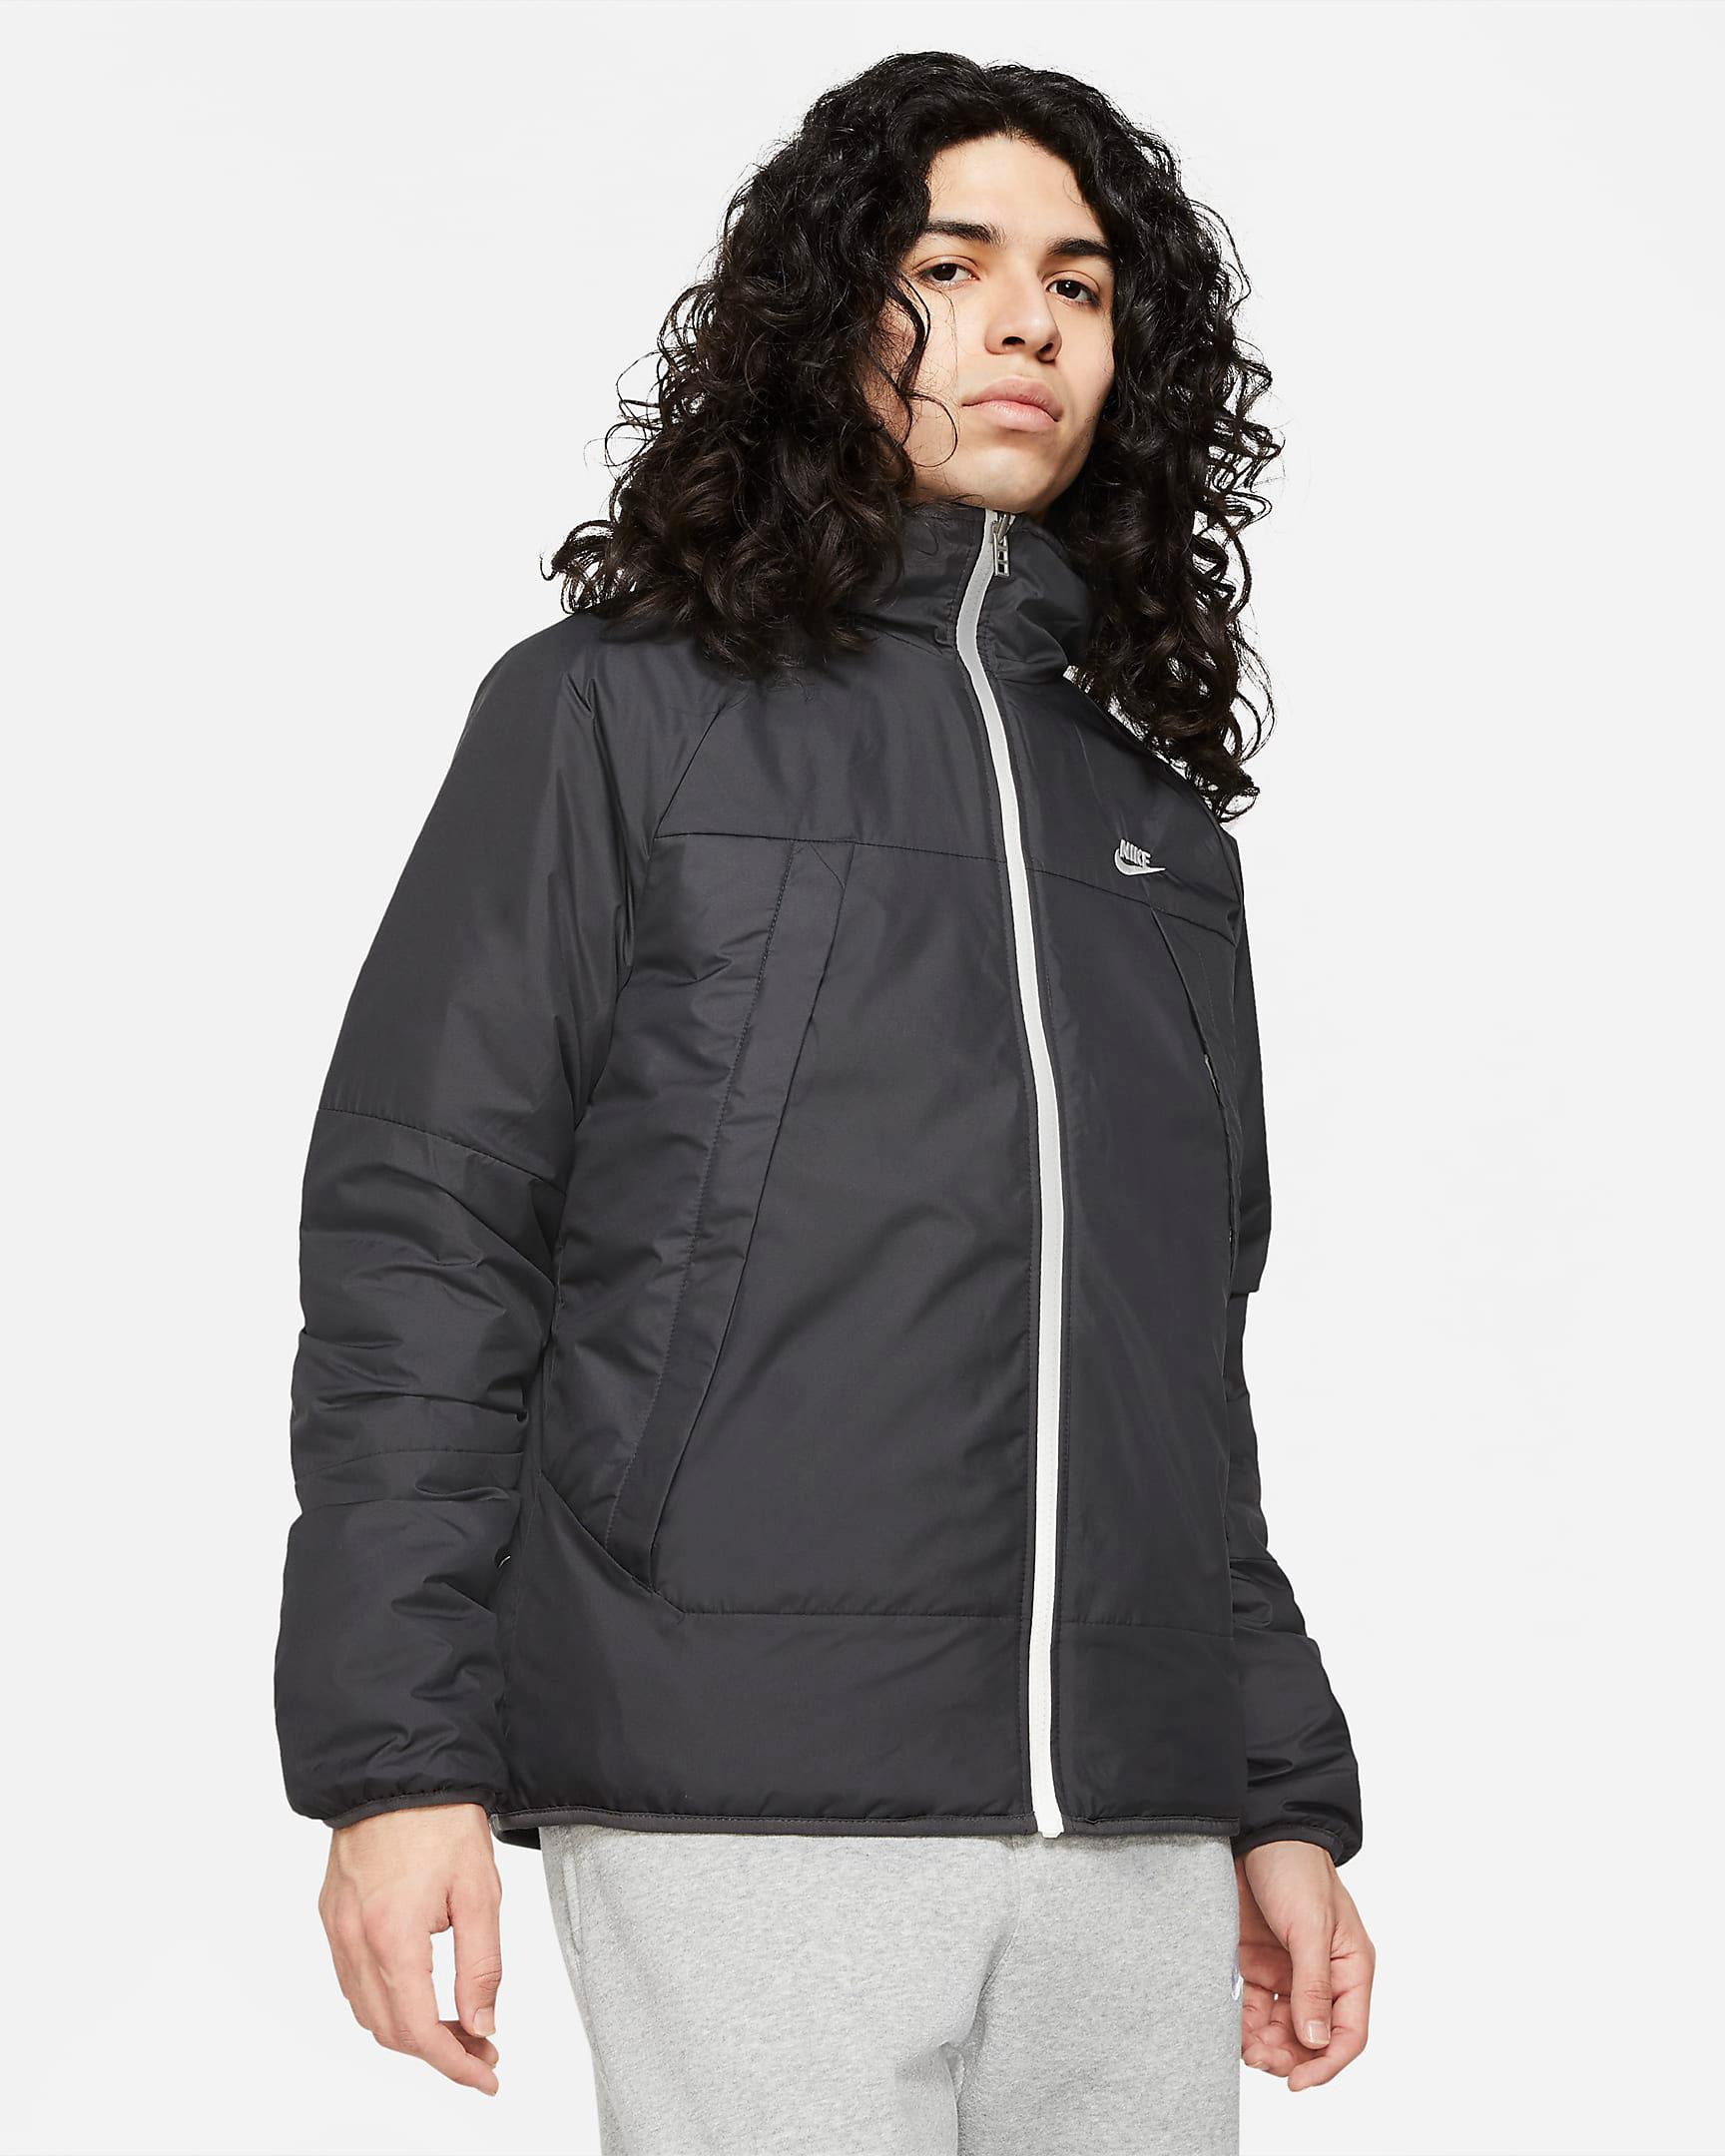 nike-sportswear-therma-fit-legacy-reversible-hooded-jacket-black-sail-3